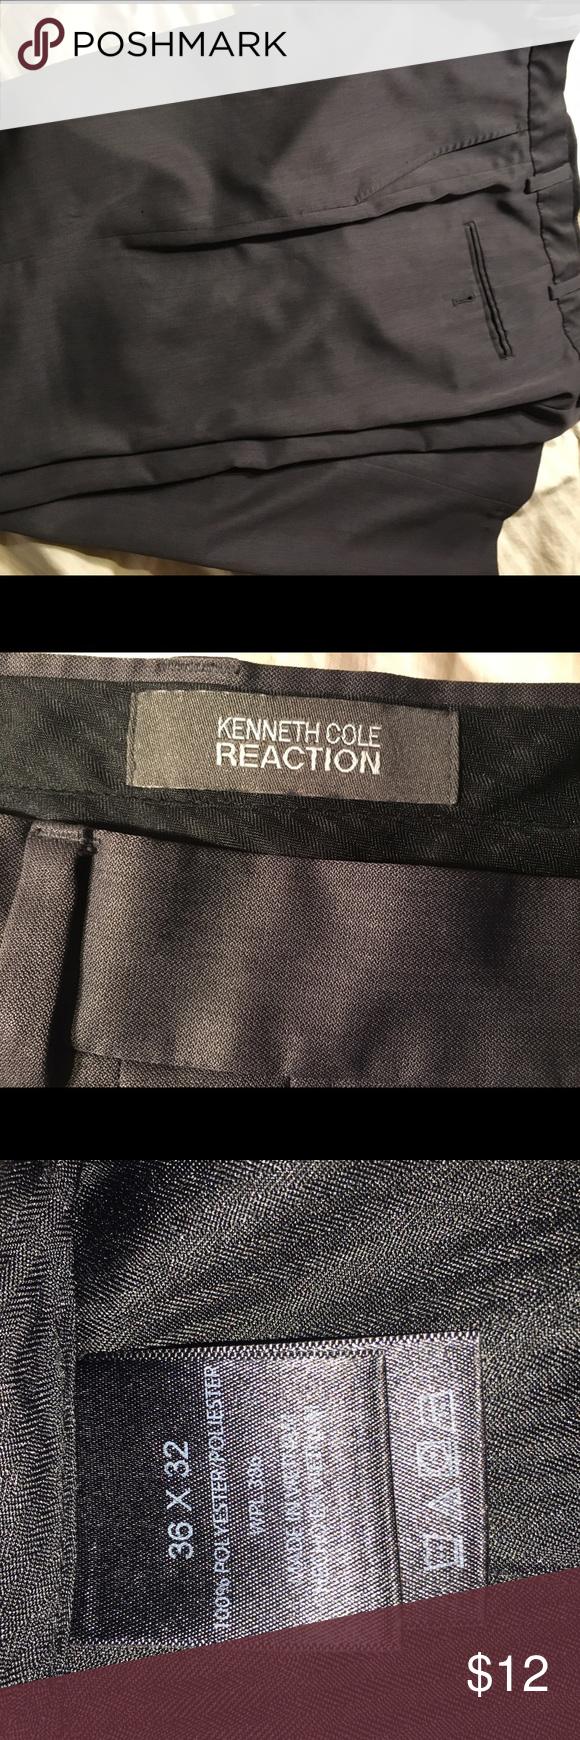 Kenneth Cole Reaction dress slacks 36x32 Gray 36x32 Kenneth Cole Reaction dress slacks.. Good condition Kenneth Cole Reaction Pants Dress